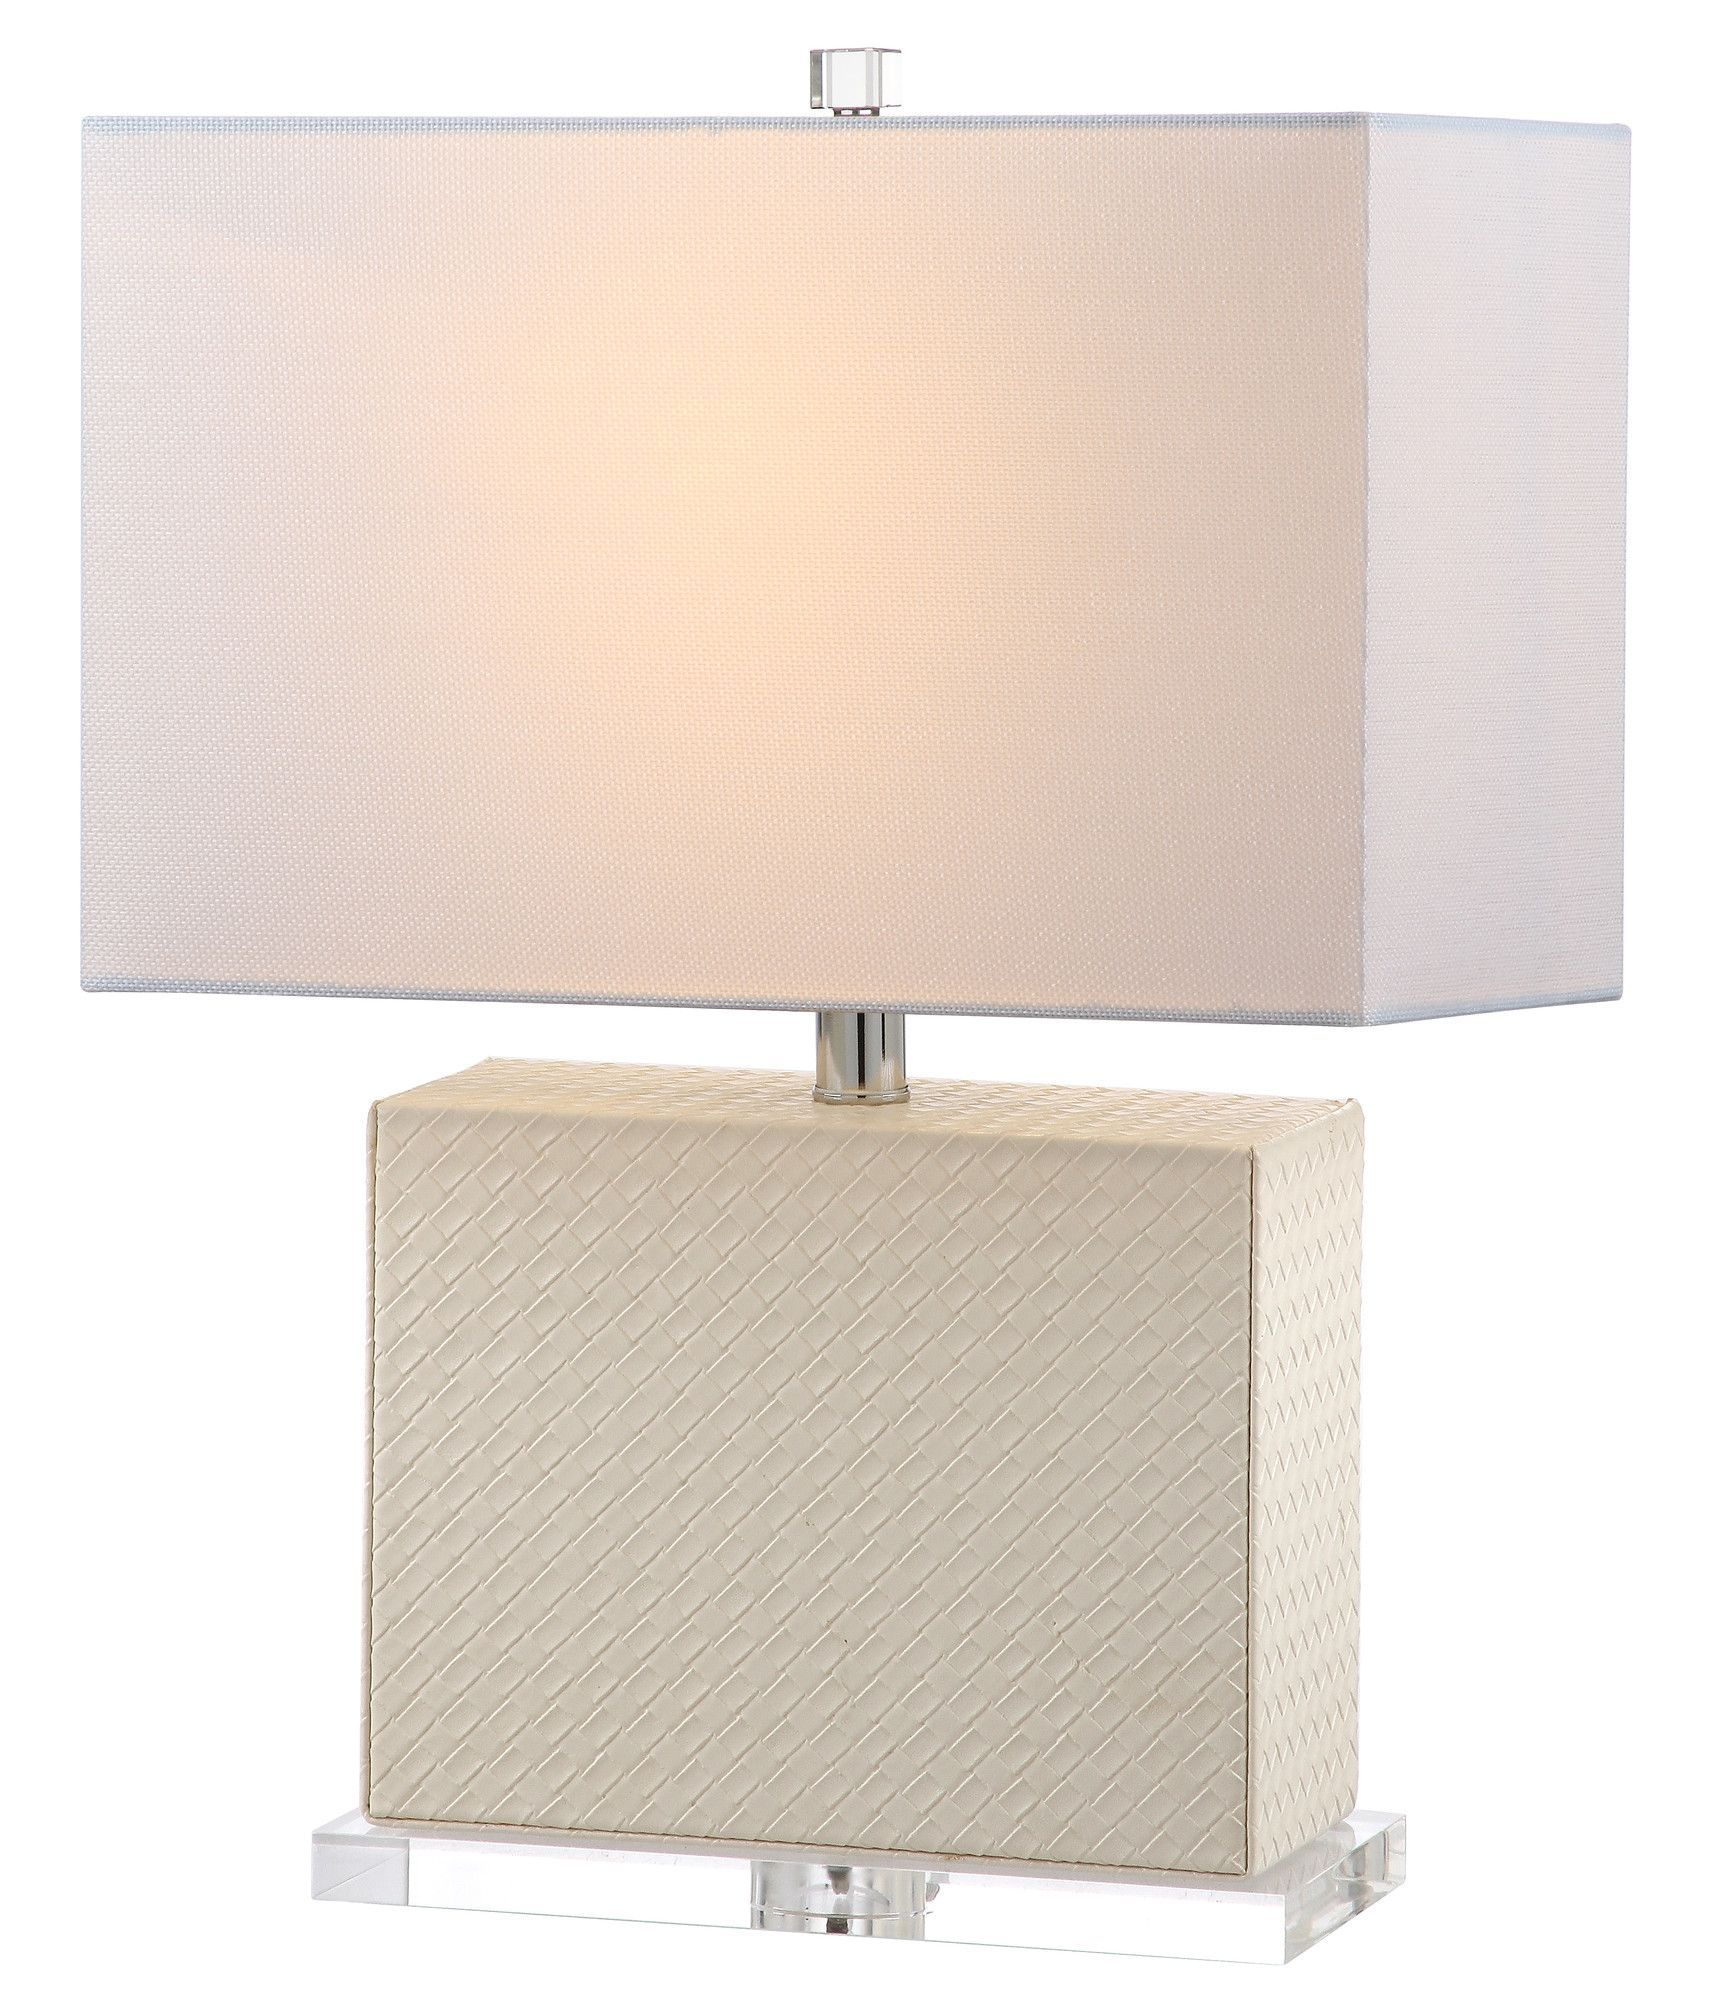 "Bozman 21.5"" Table Lamp"